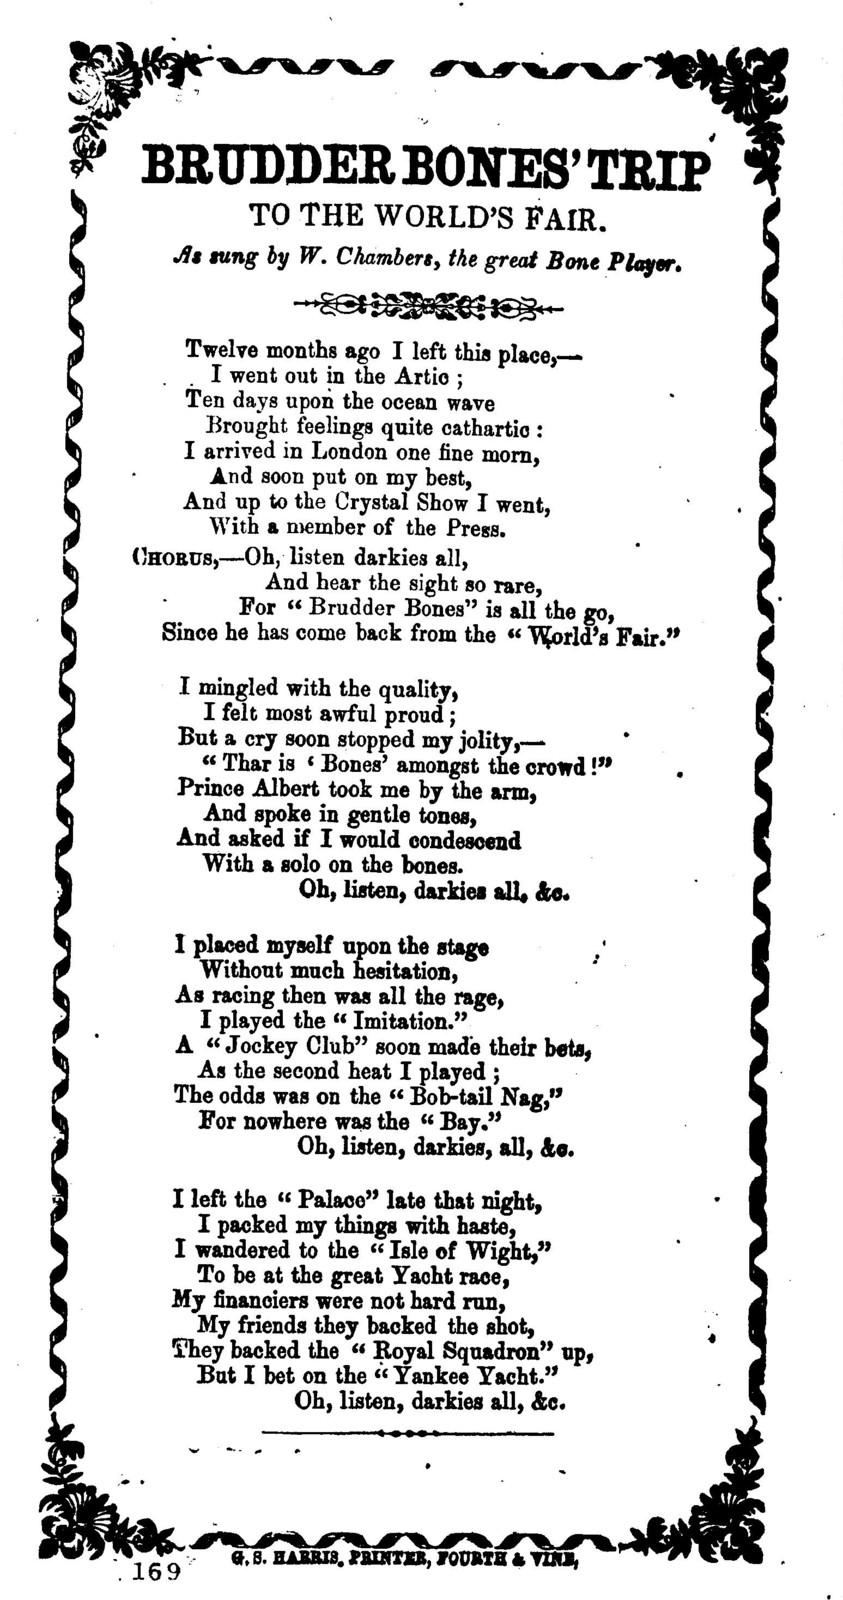 Brudder Bones' trip to the World's Fair. G. S. Harris, Printer, Fourth & Vine